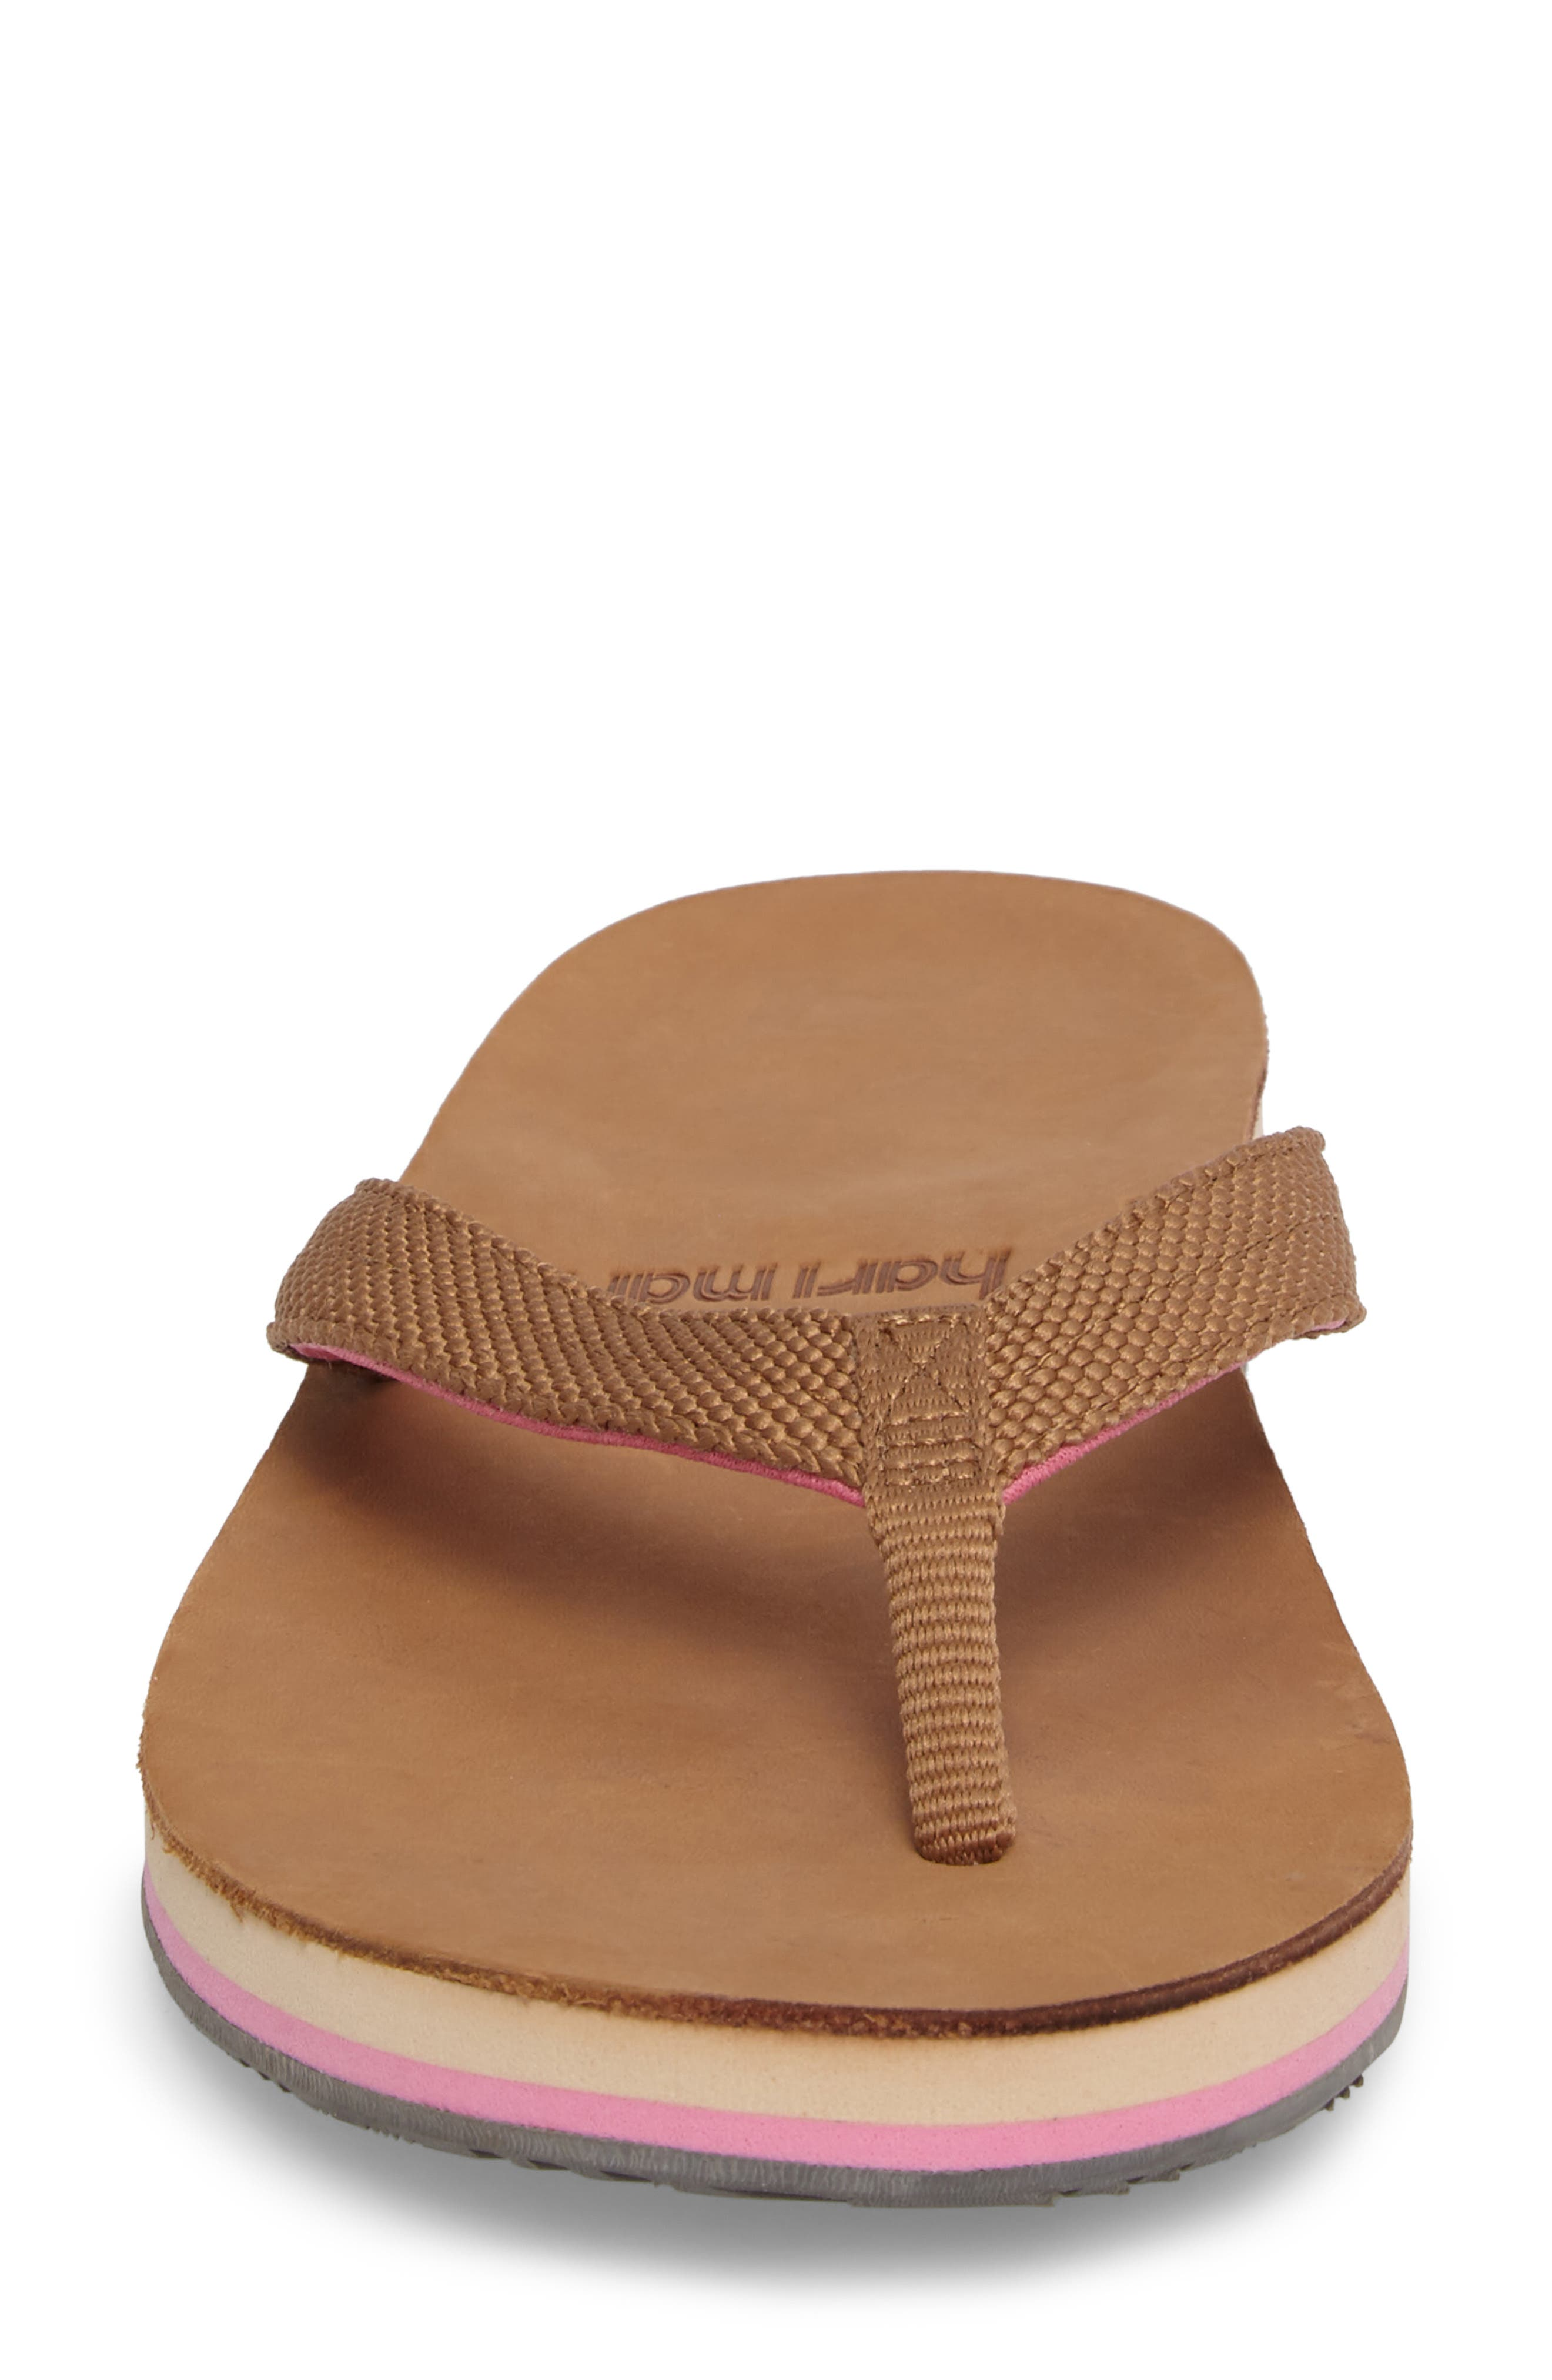 Scouts Flip Flop,                             Alternate thumbnail 4, color,                             Tan/ Shell Pink